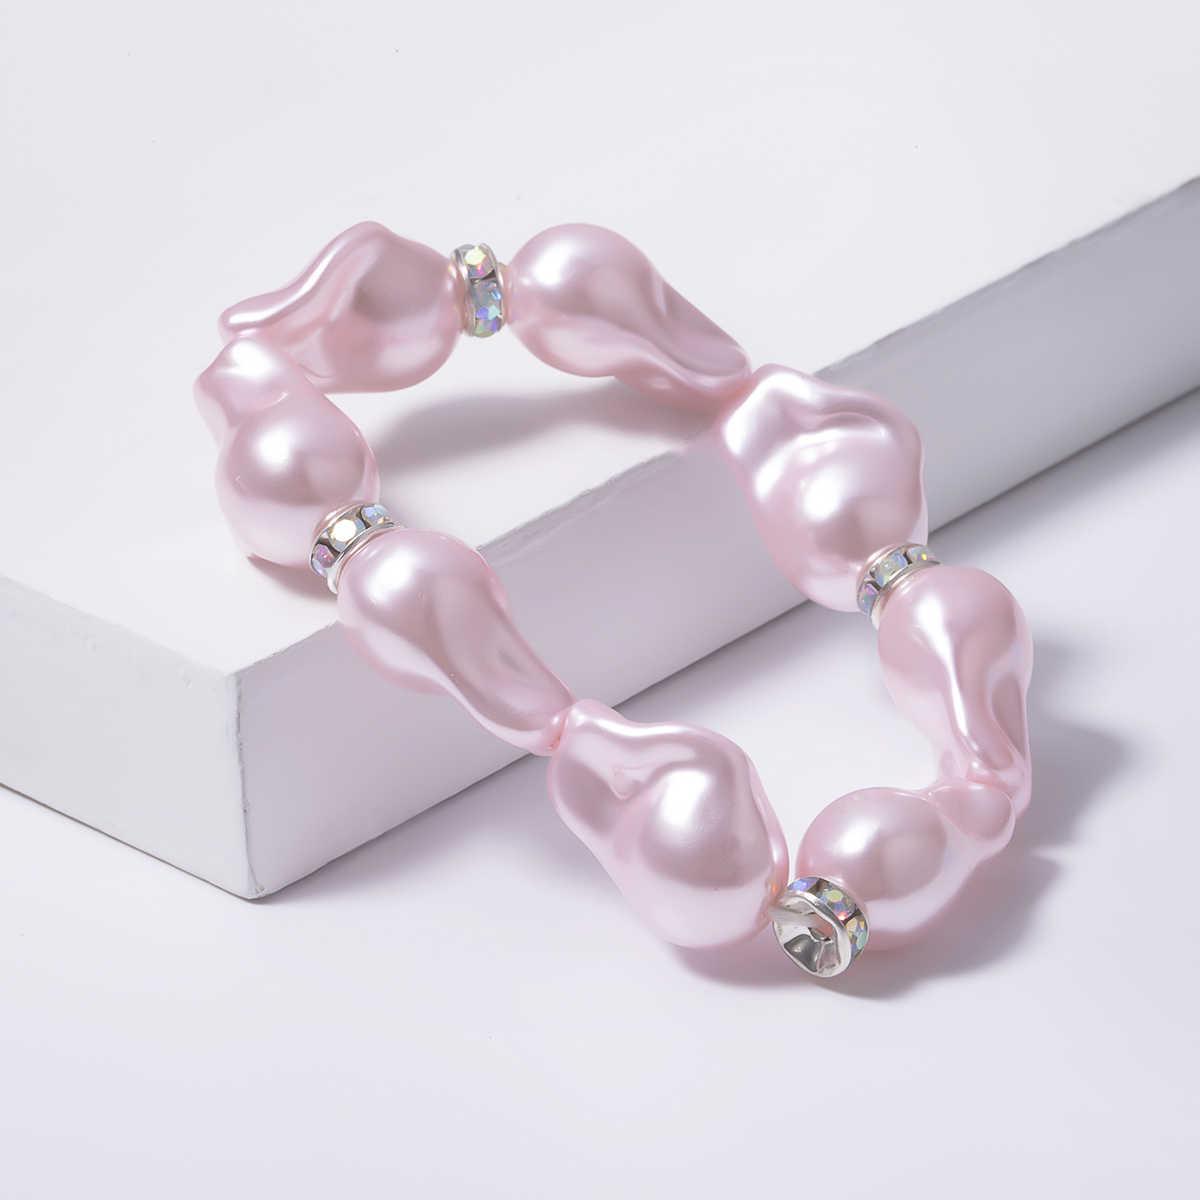 Ingemark Hawaii Simulated Pearl Choker Necklace NE+BA Statement Korean Bead Pendant Chain Bracelet Ankle Women Wedding Jewelry